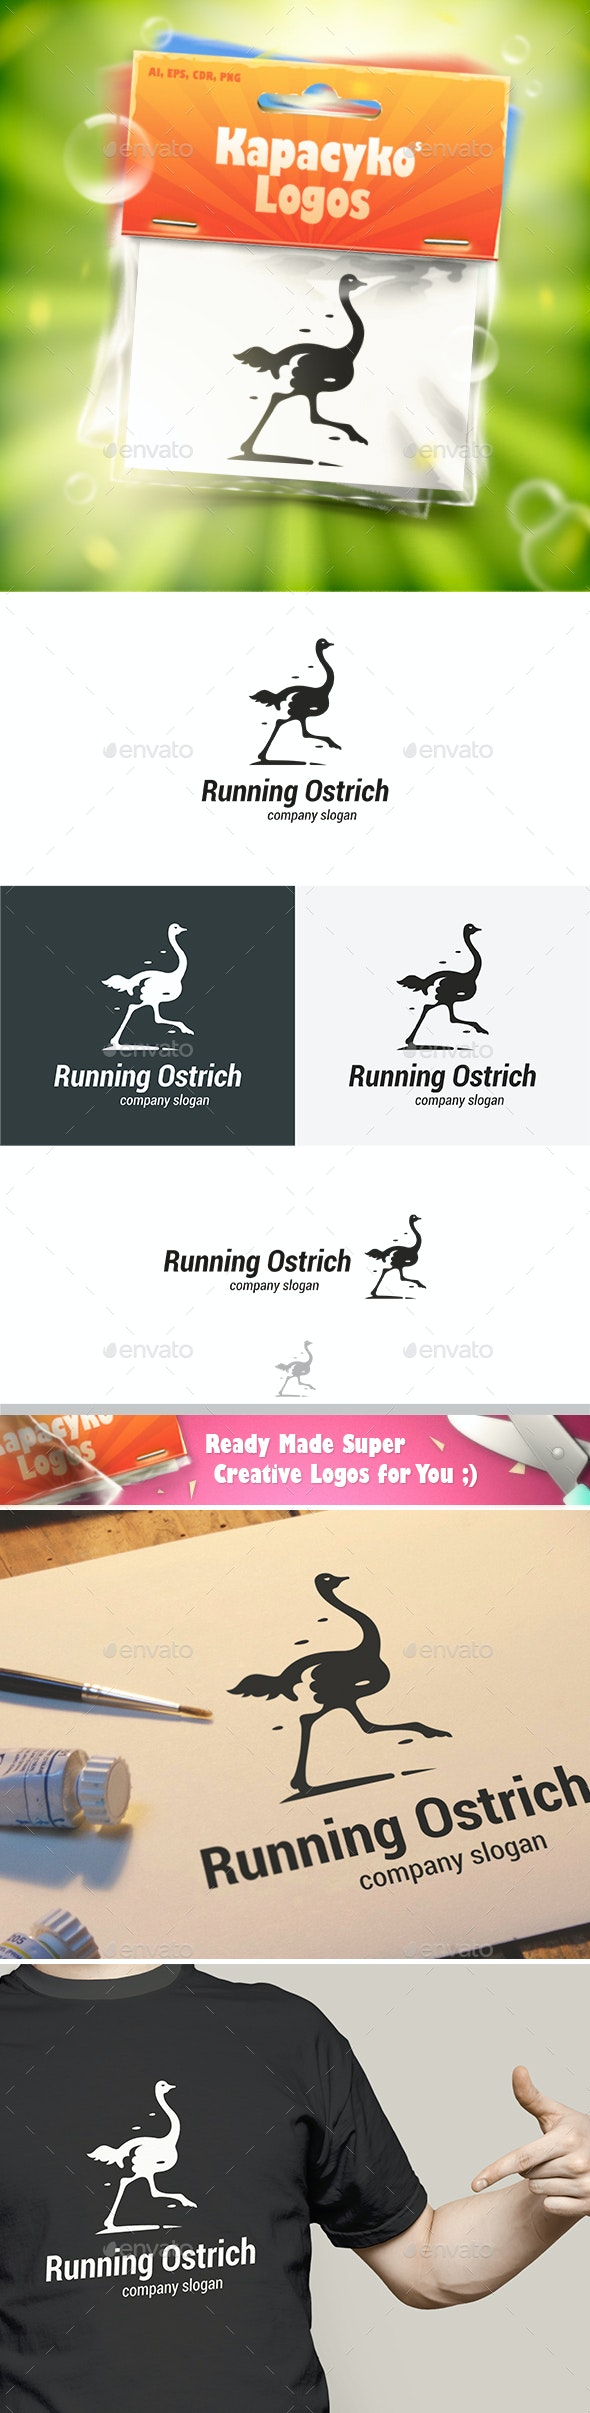 Running Ostrich Logo - Animals Logo Templates